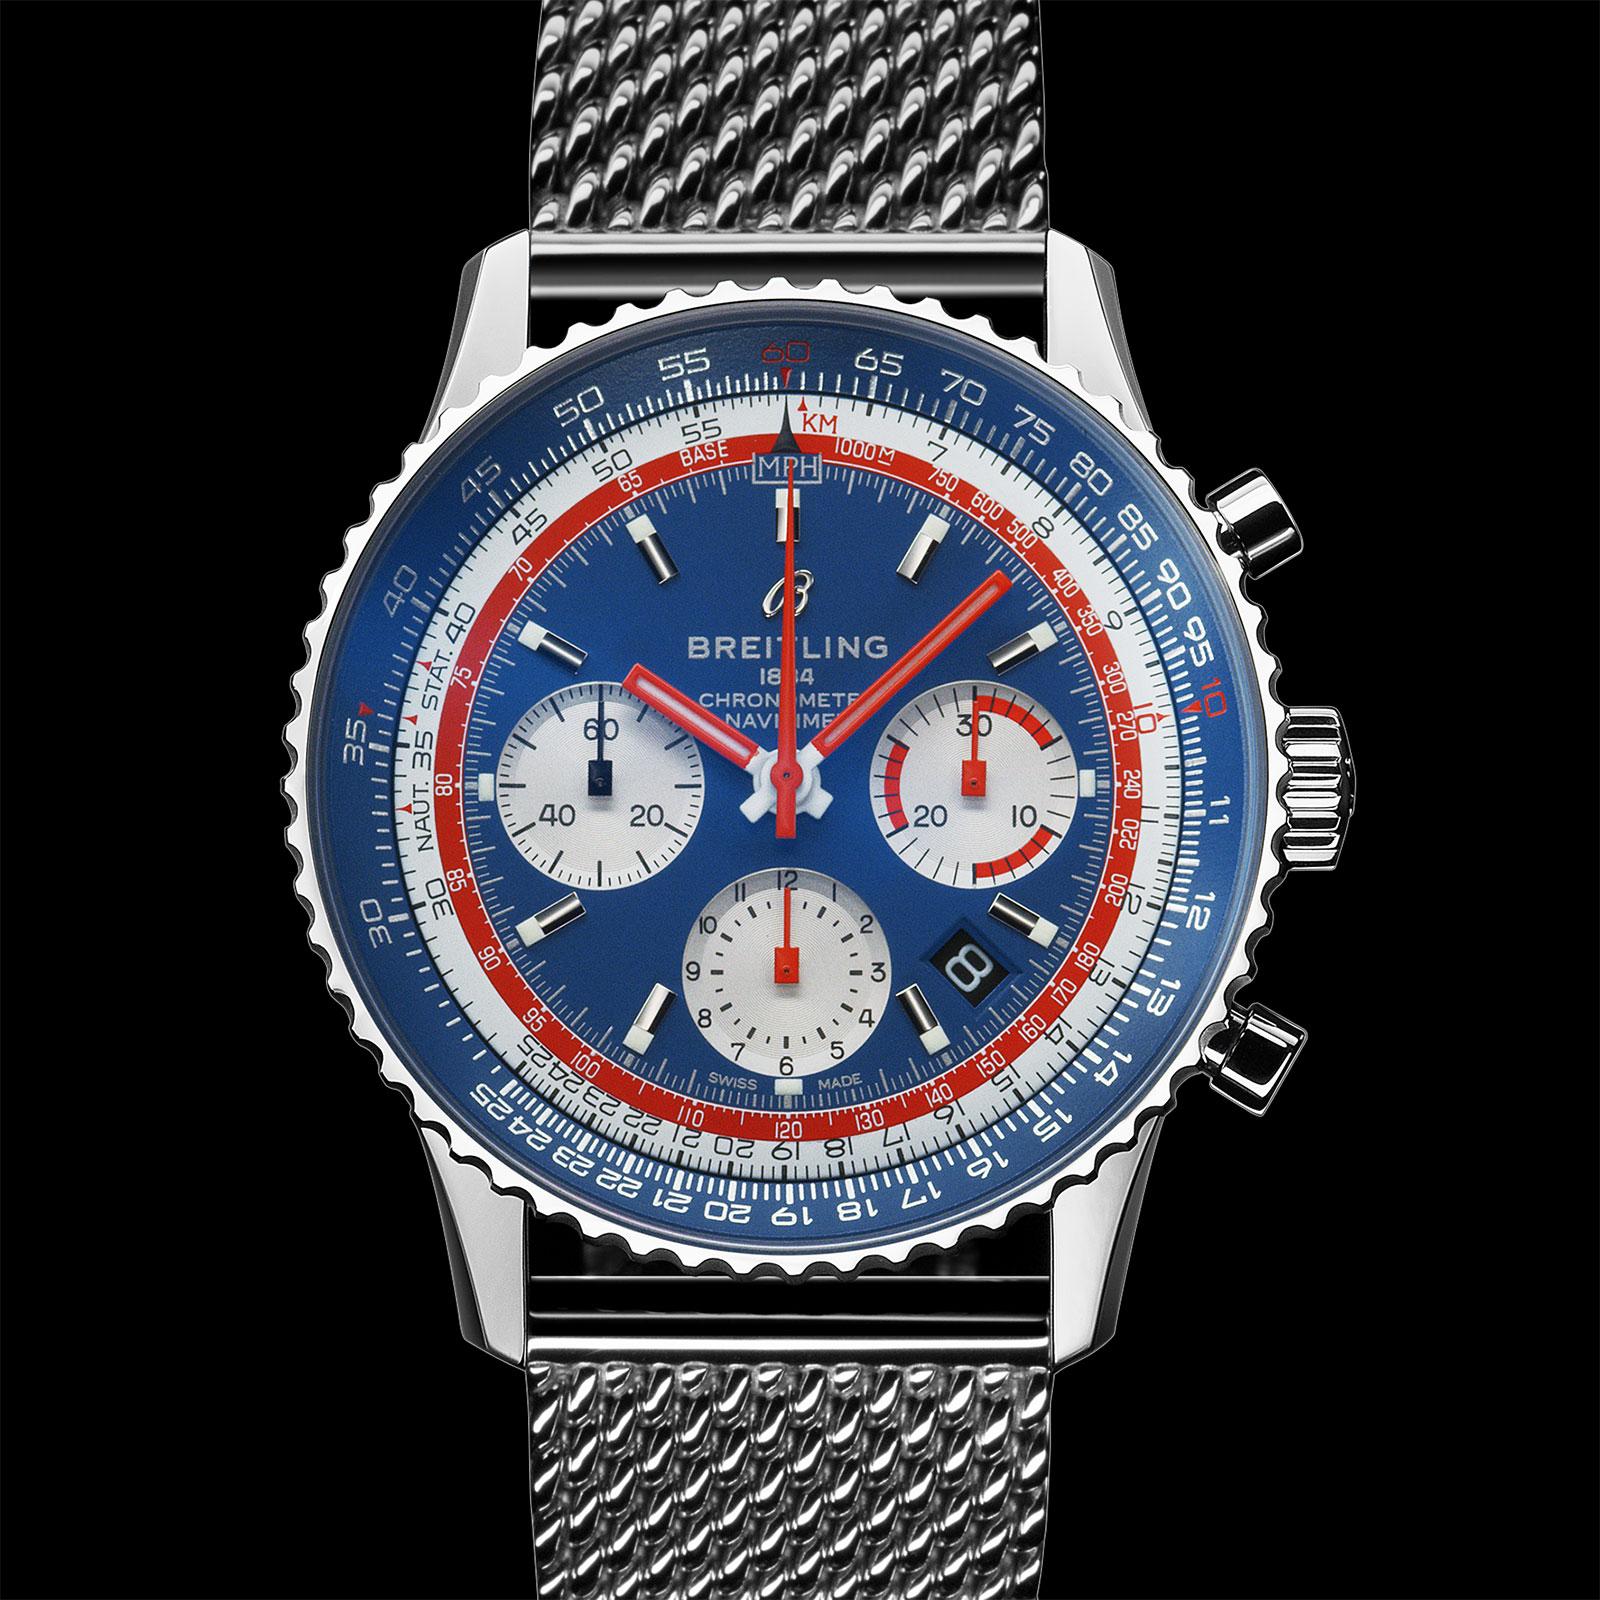 Breitling Navitimer 1 B01 Chronograph 43 Pan Am